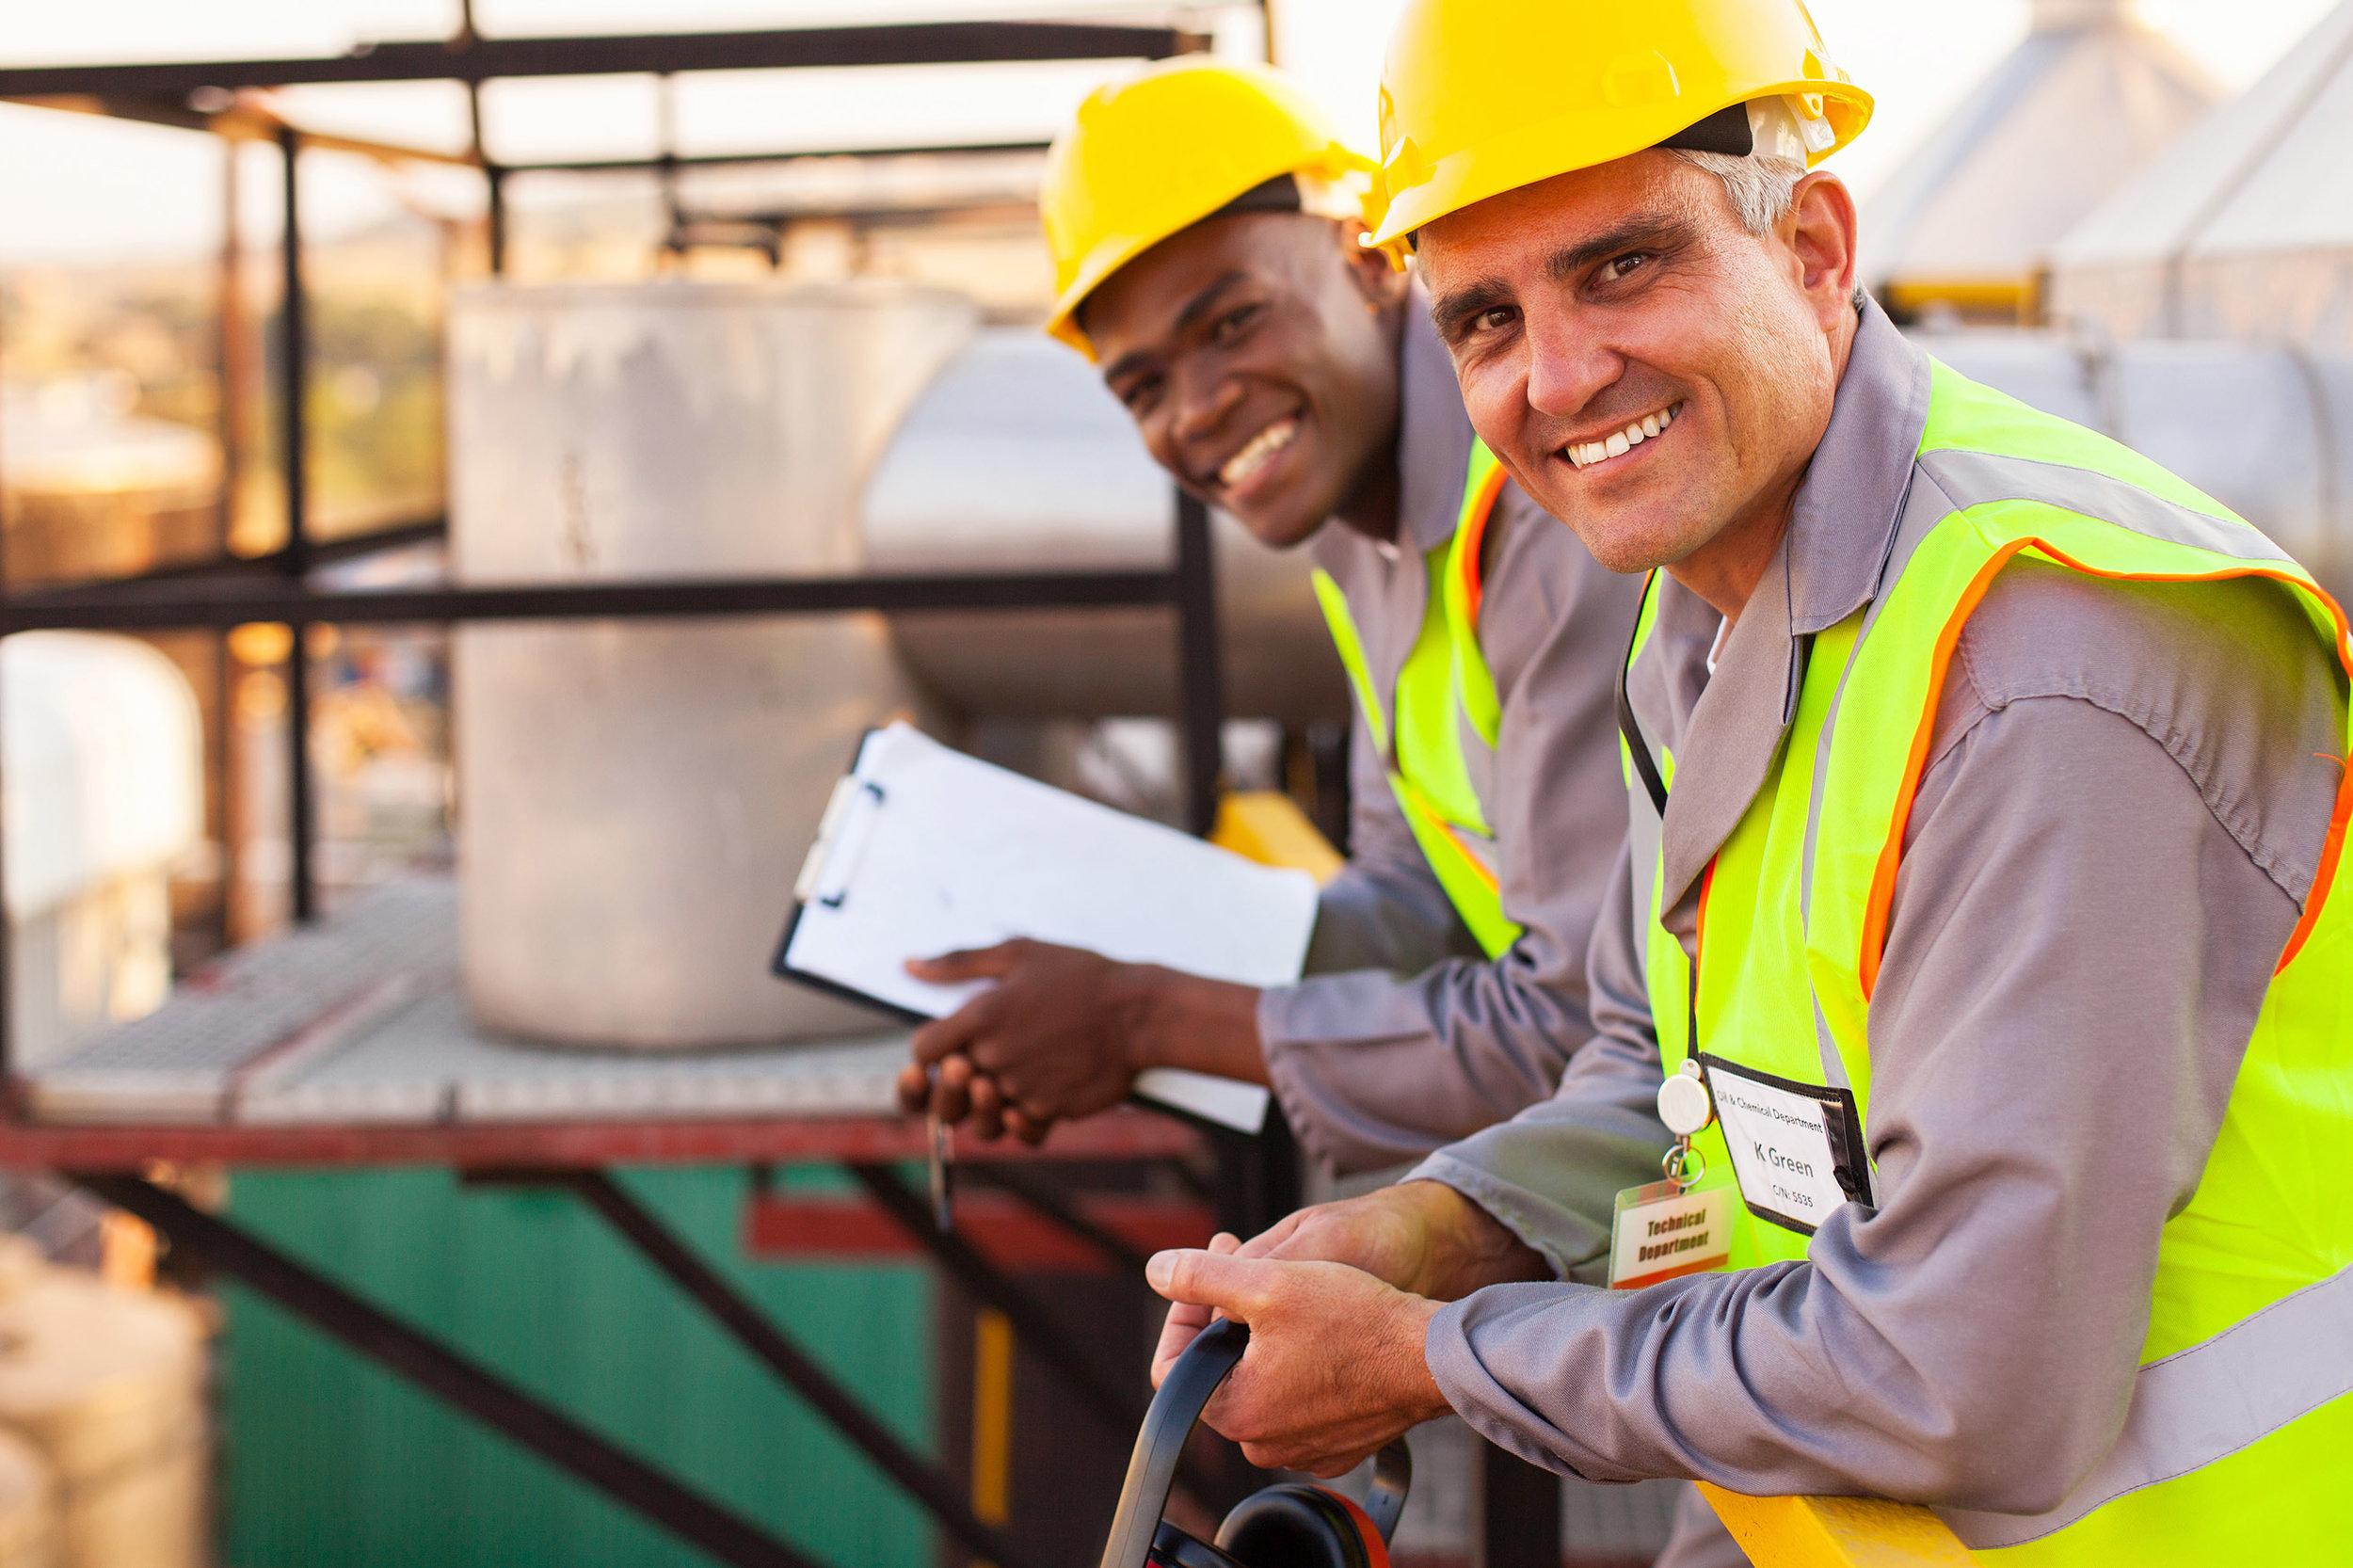 Happy workers_hard hats.jpg